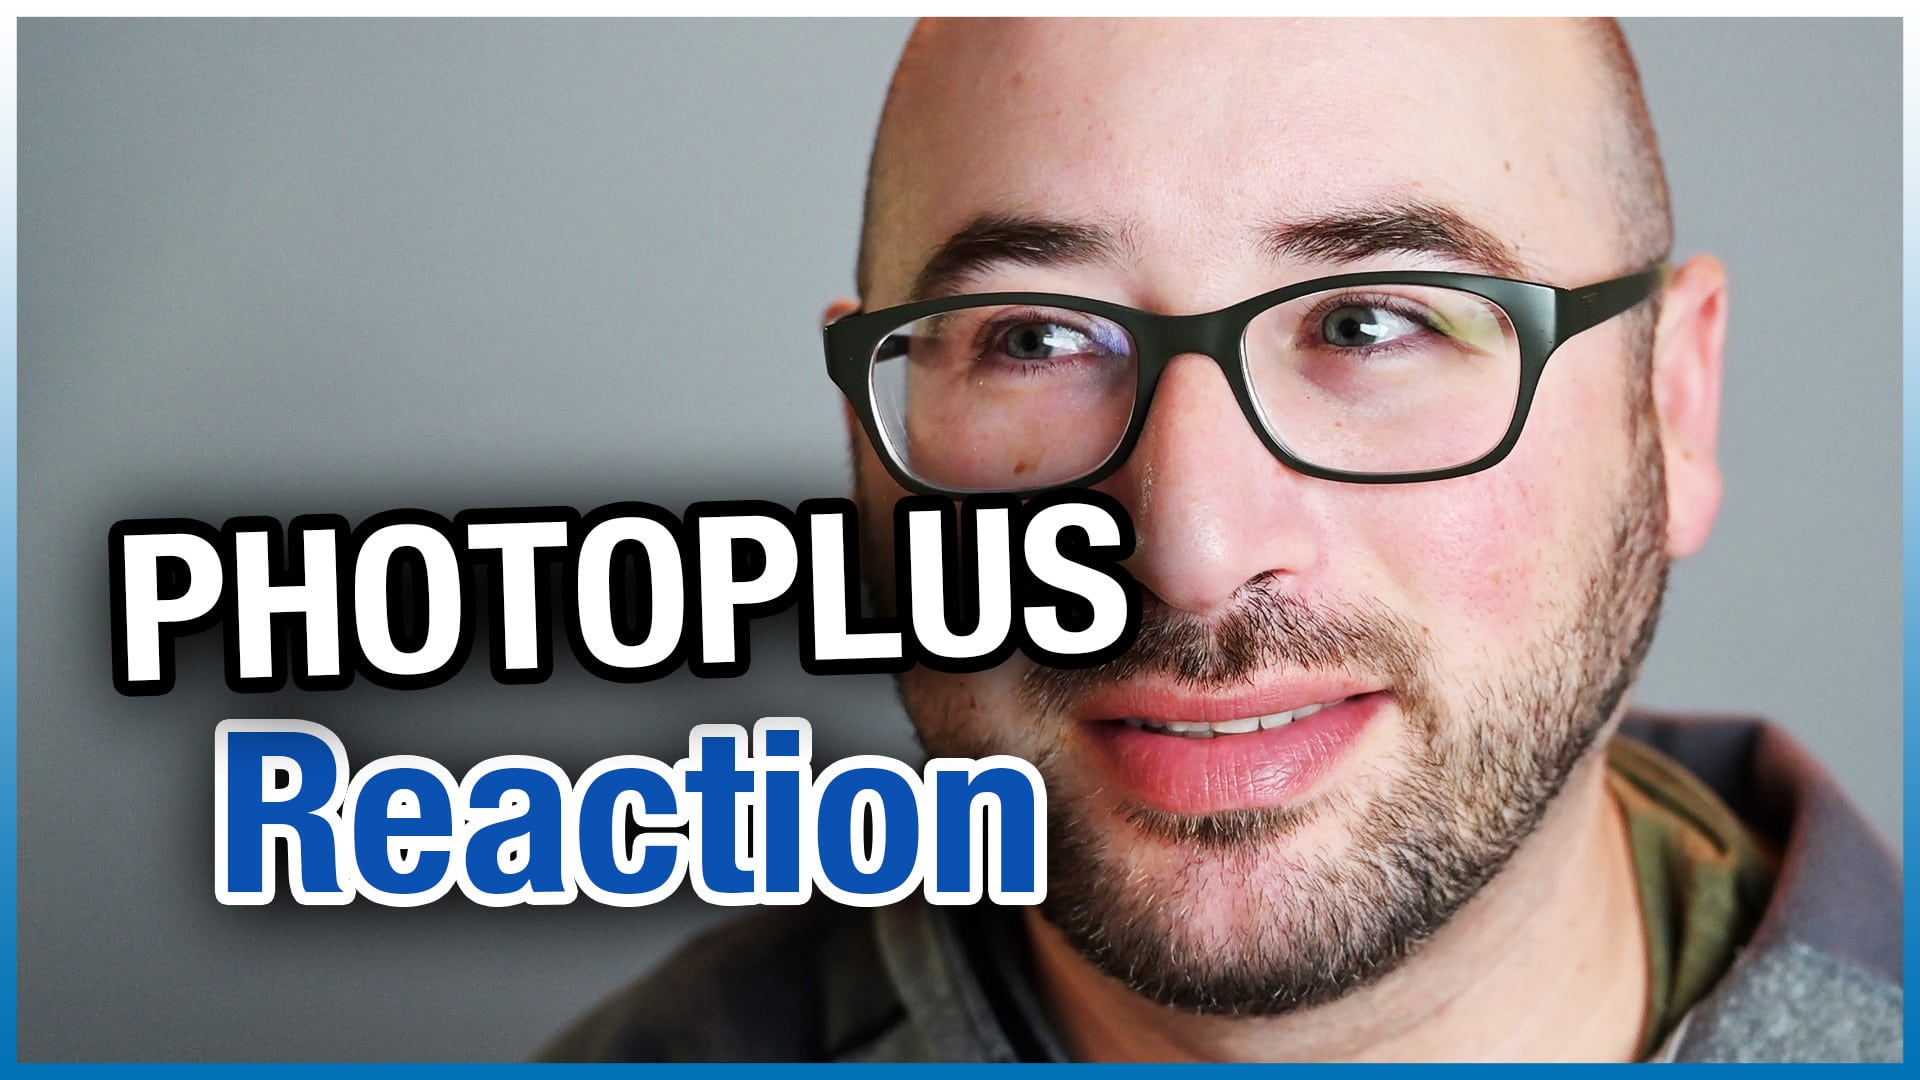 PhotoPlus 2019 Reaction